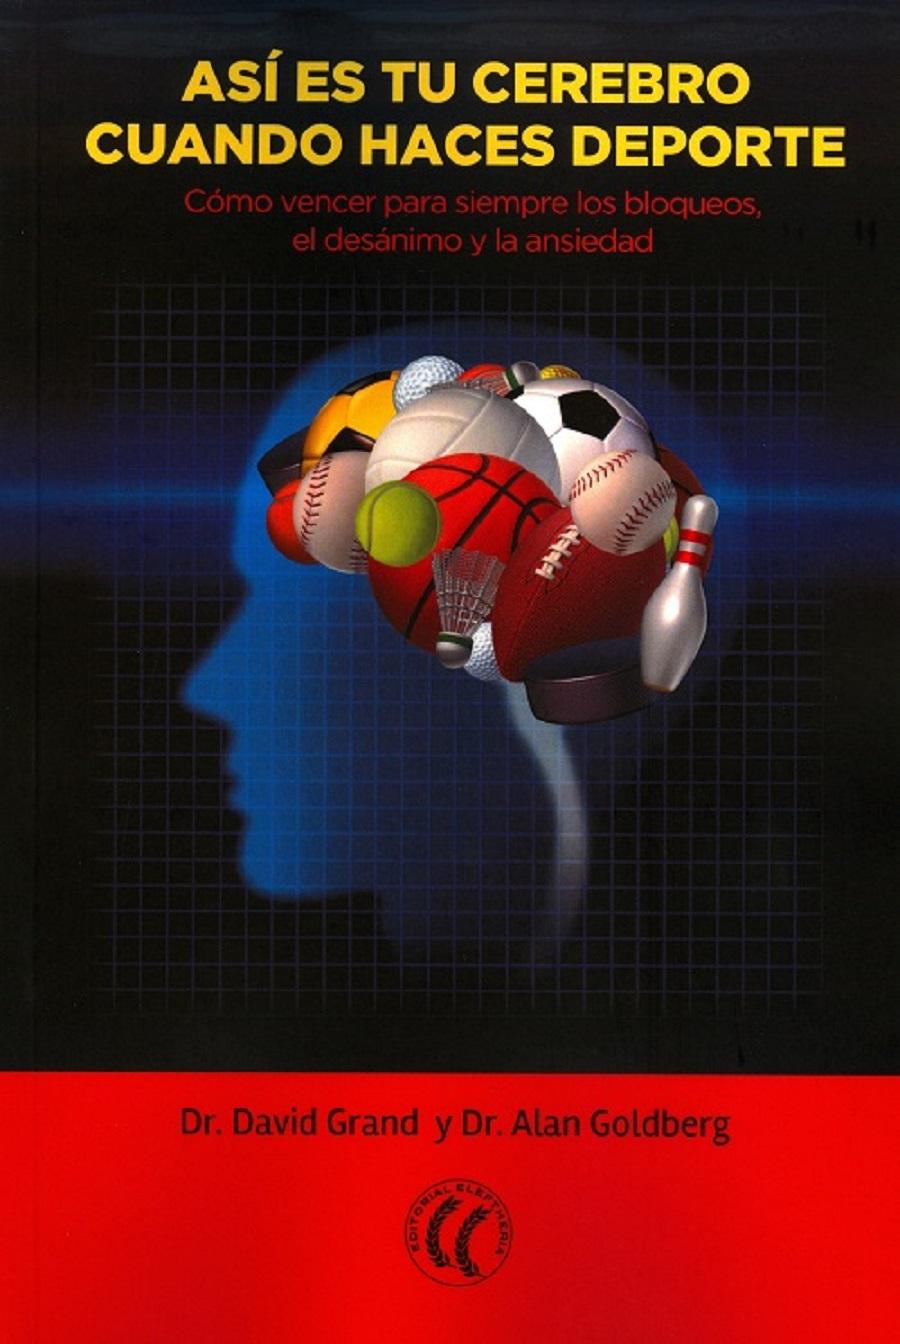 así es tu cerebro deporte